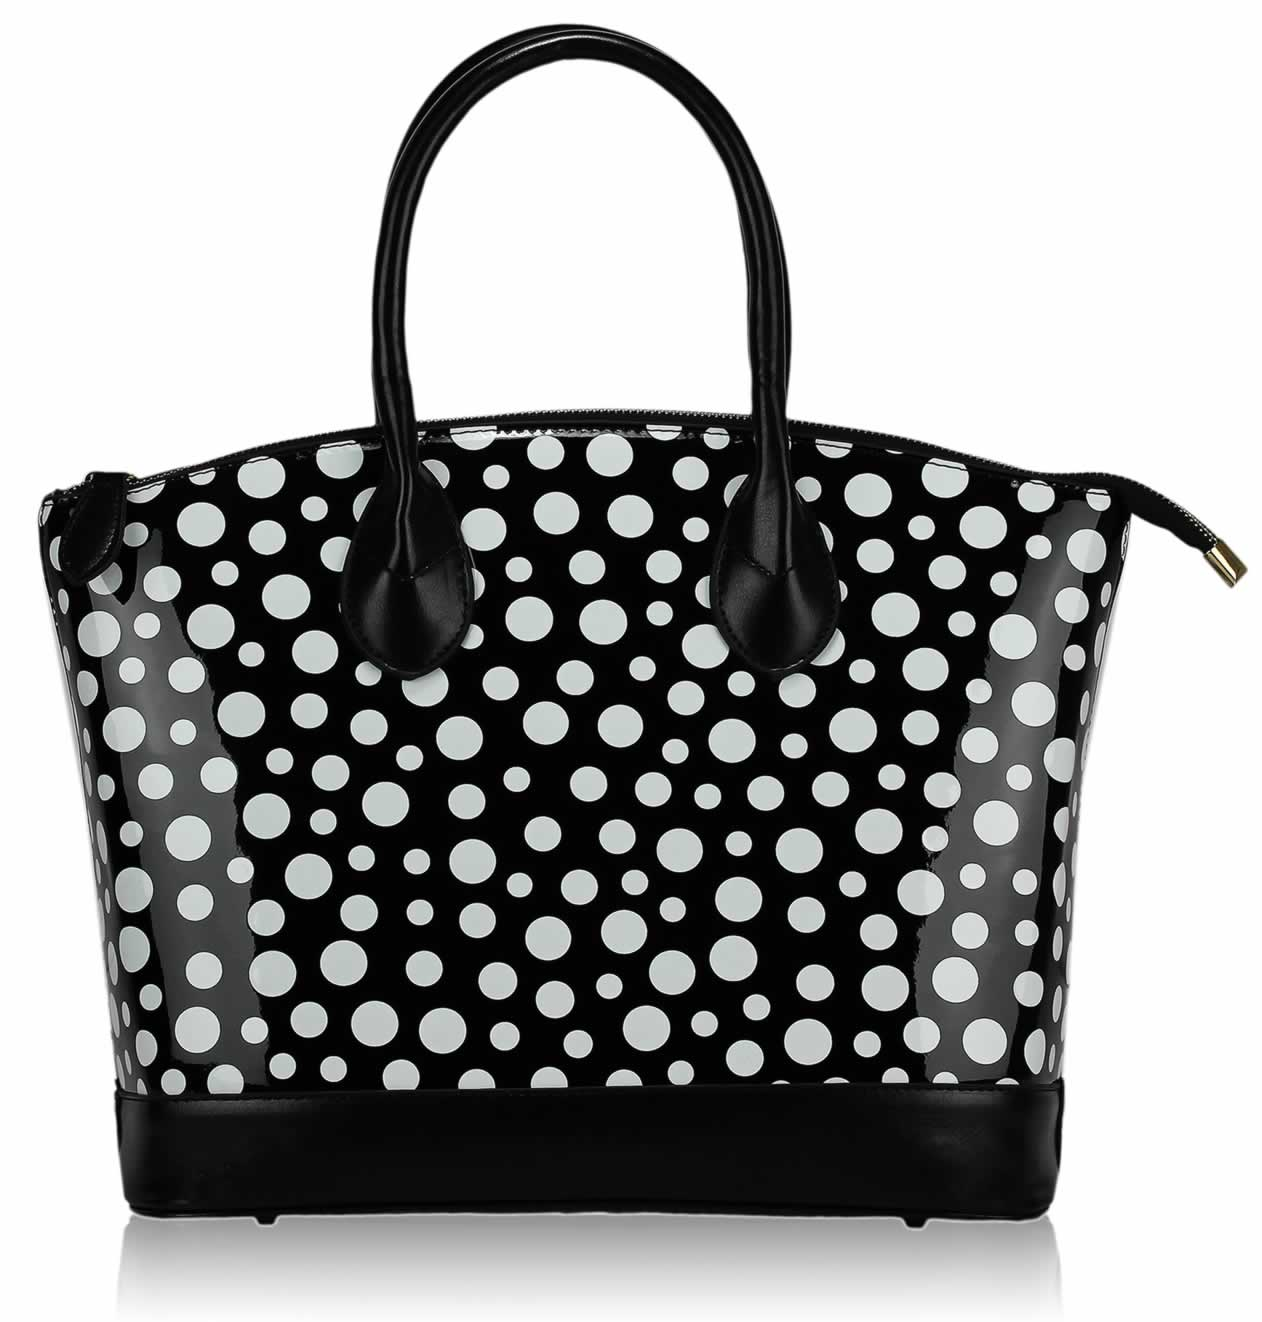 black and white polka dot handbag